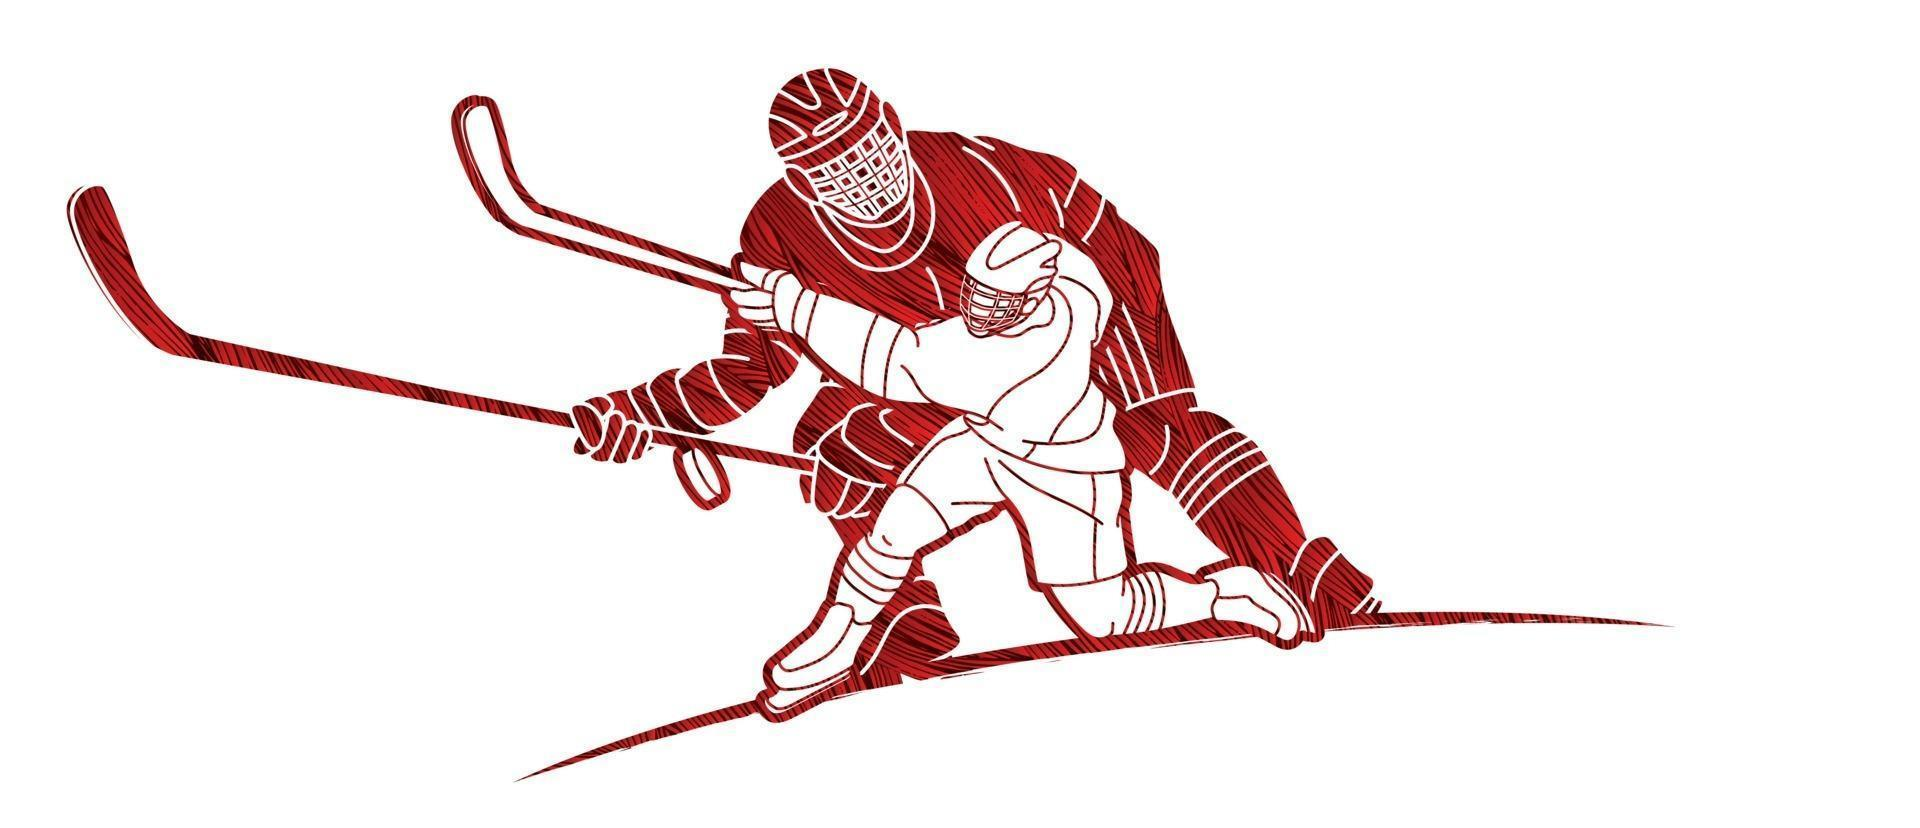 Silhouette Ice Hockey Players vector